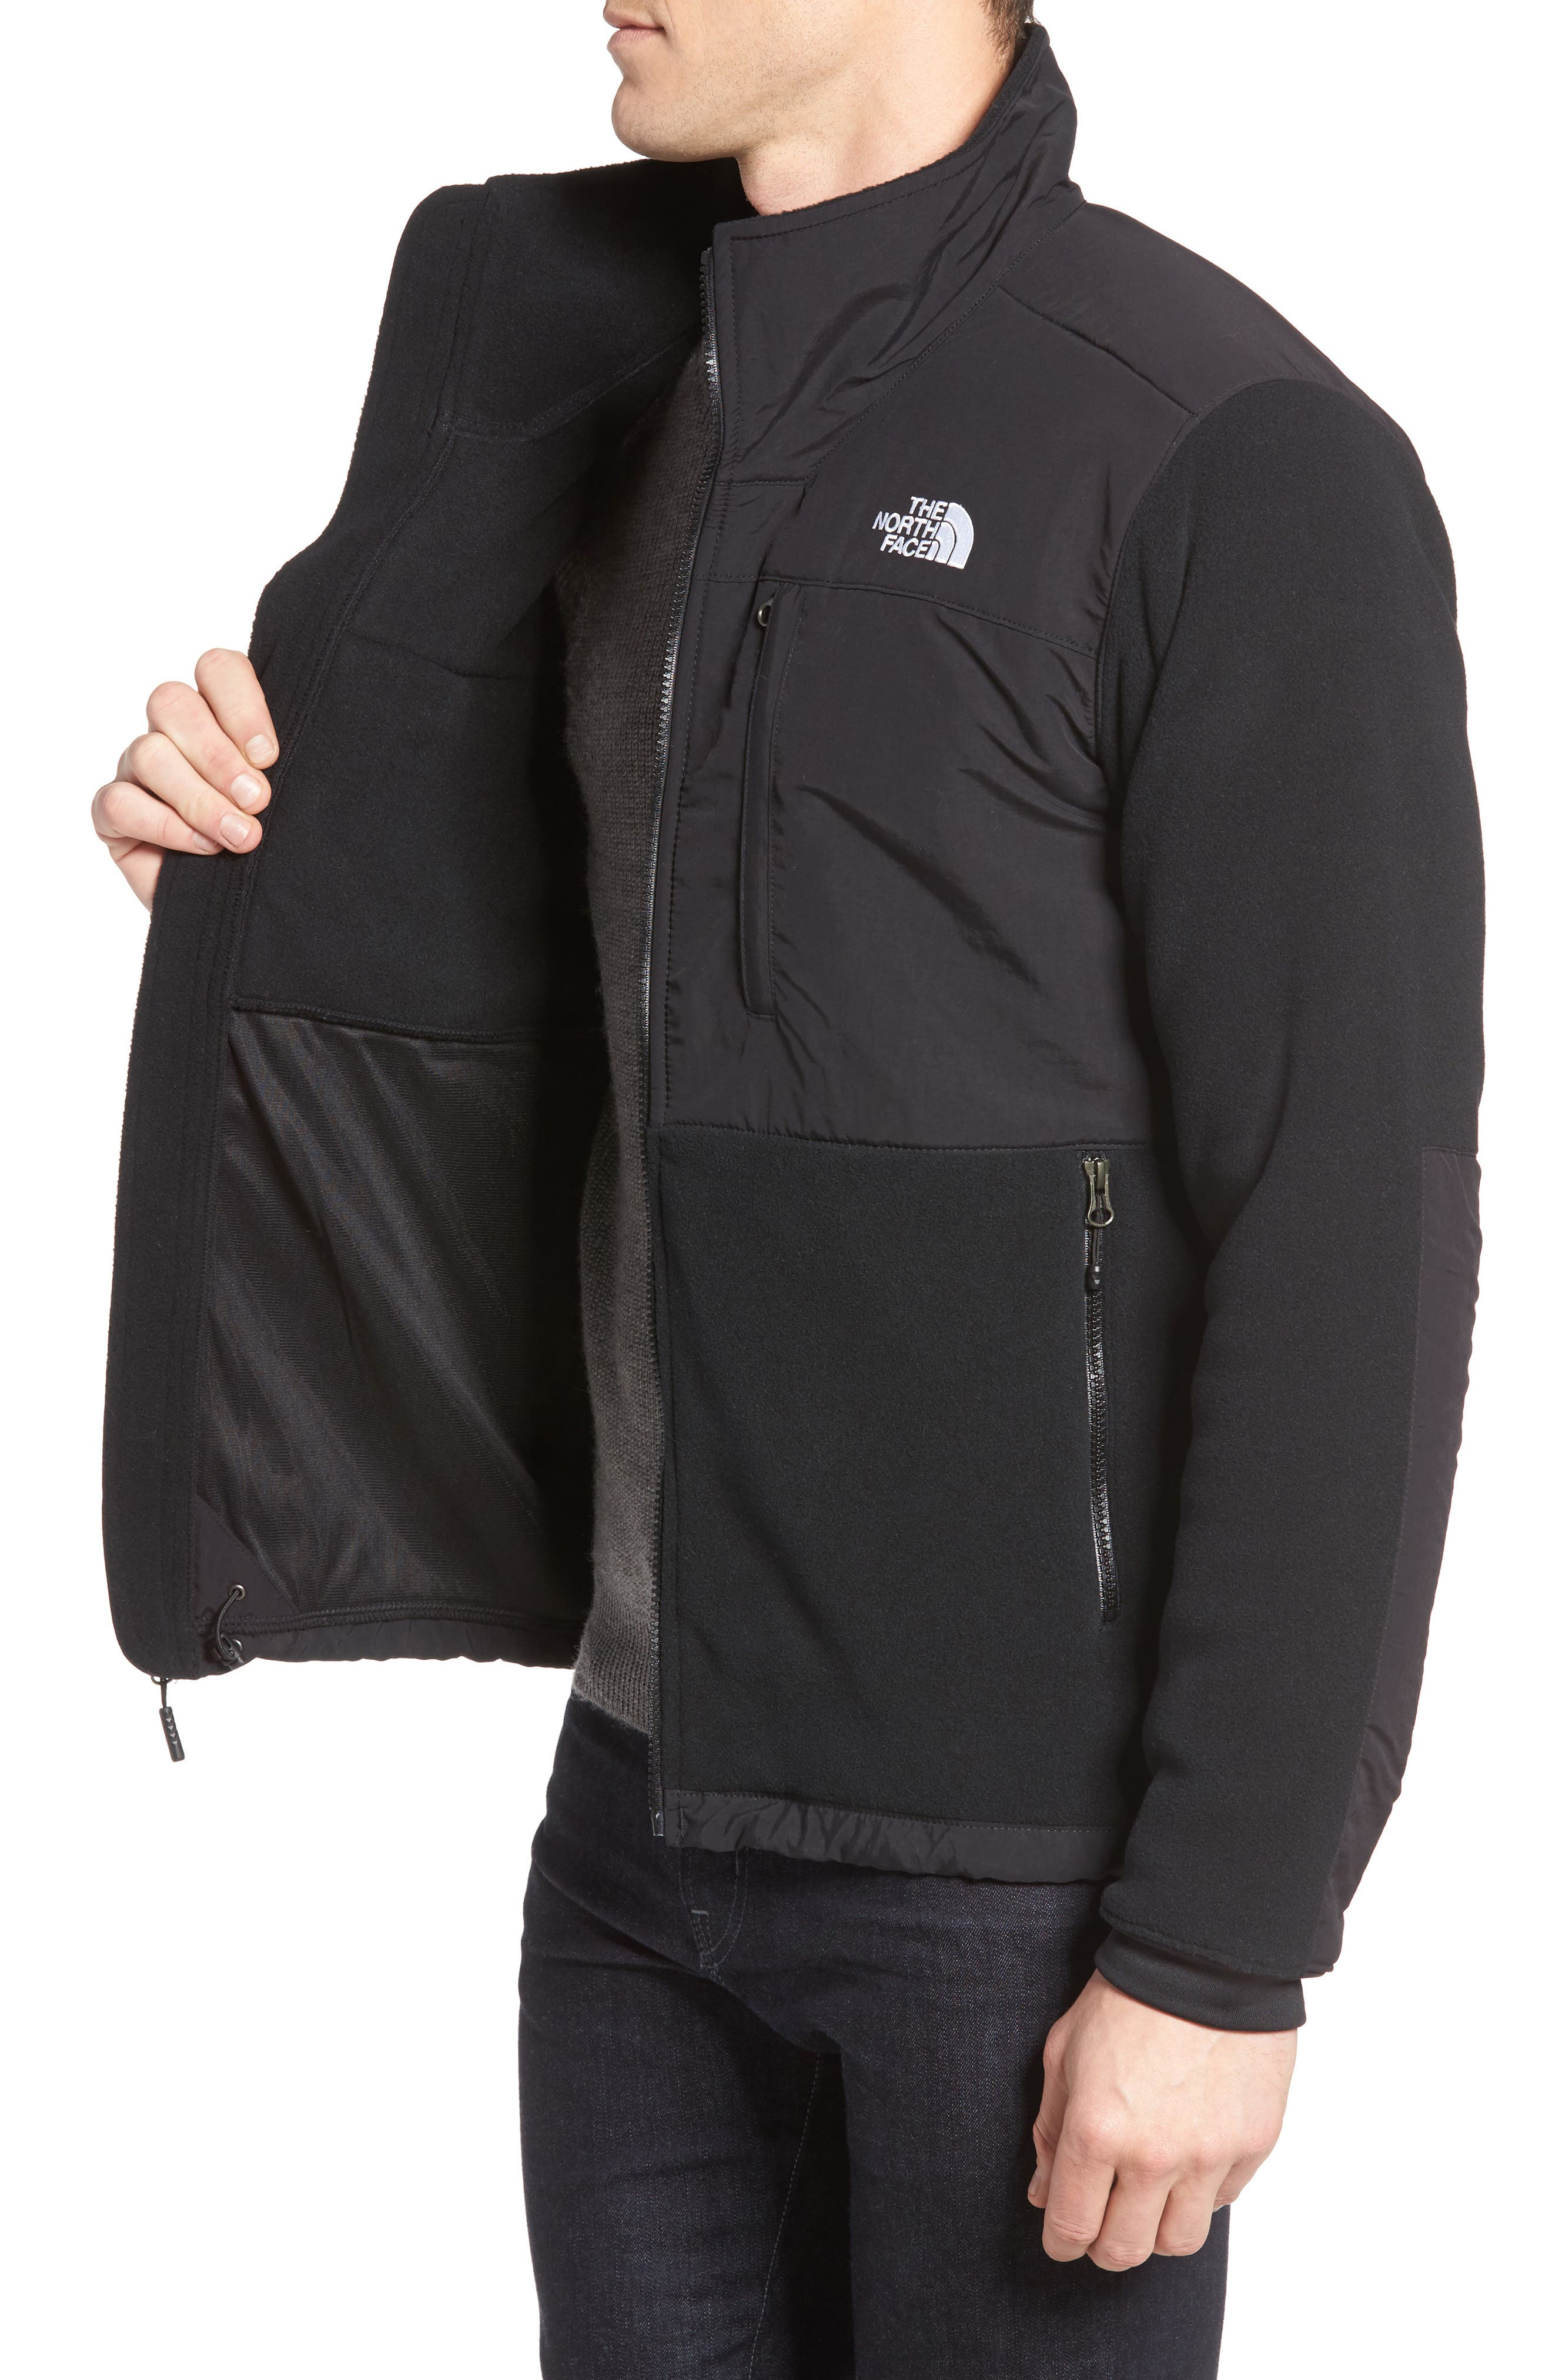 Denali 2 Recycled Fleece Jacket,                             Alternate thumbnail 4, color,                             001